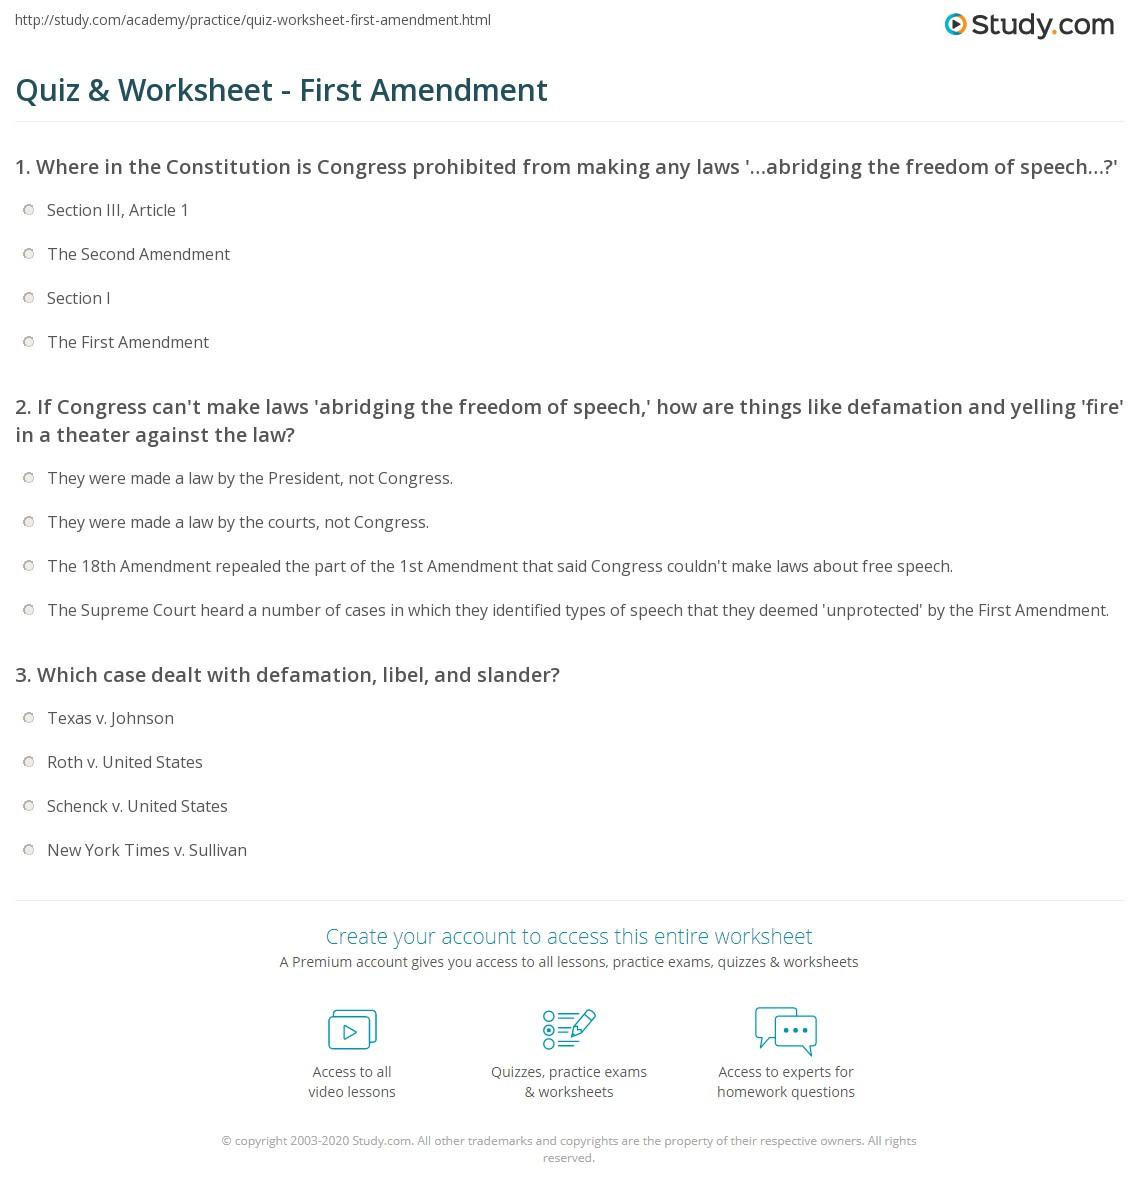 Quiz & Worksheet - First Amendment | Study.com